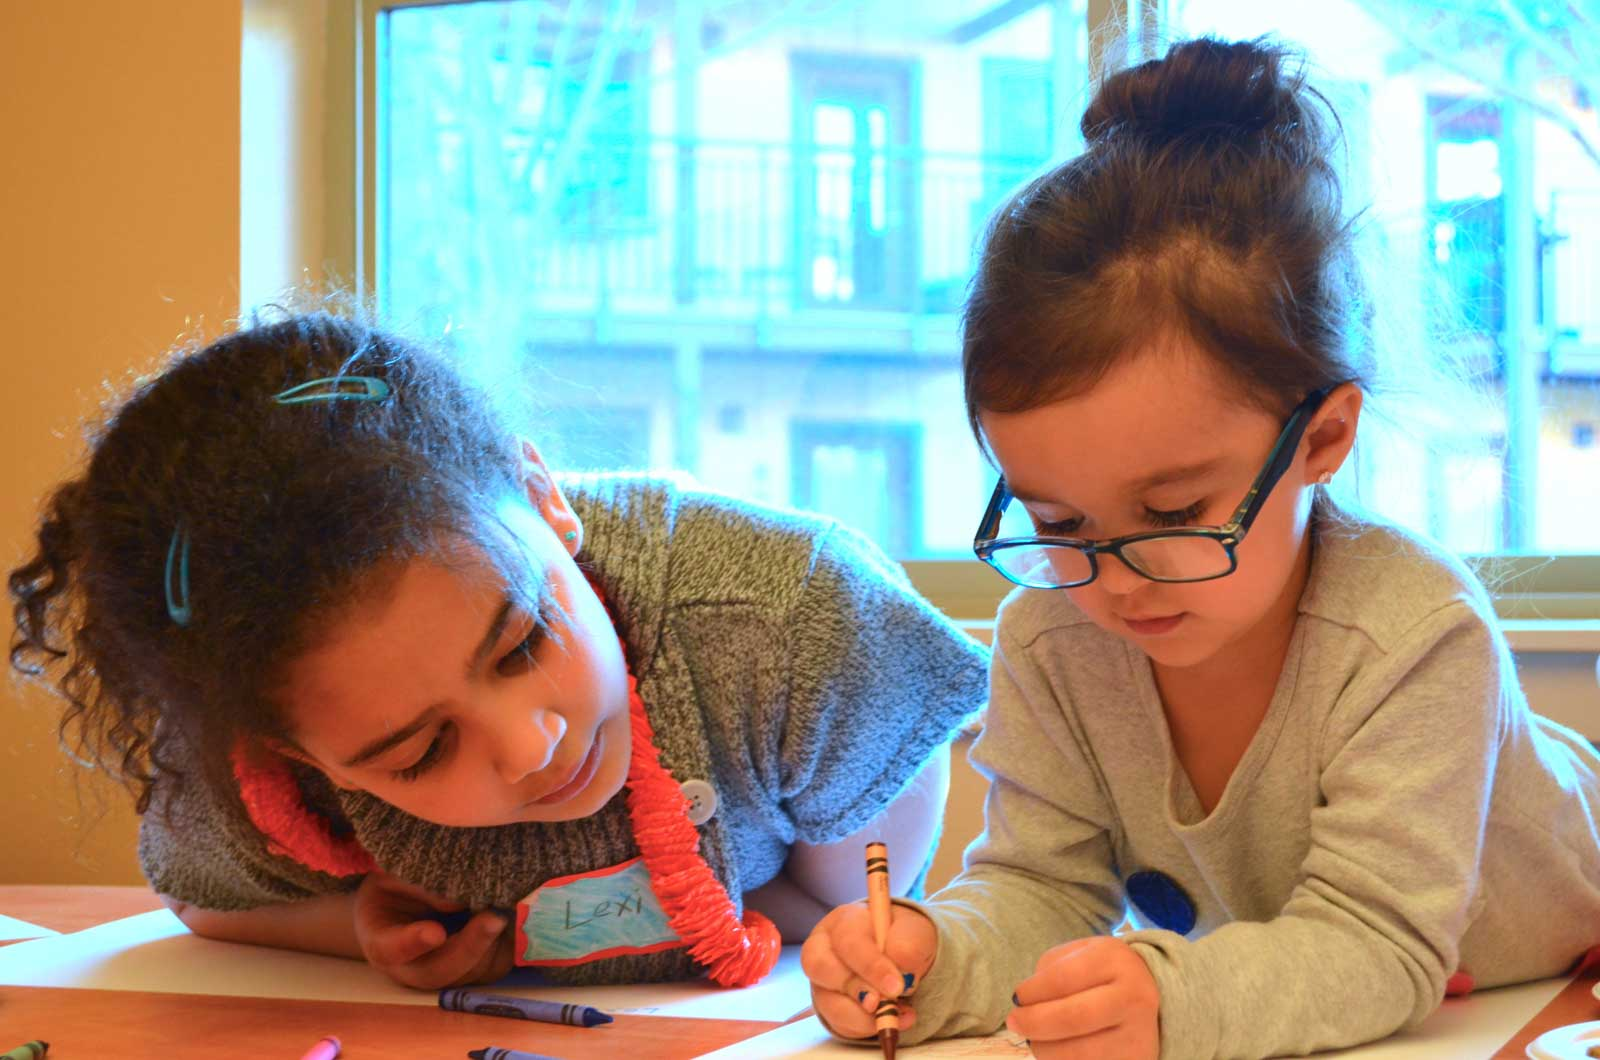 2 girls coloring